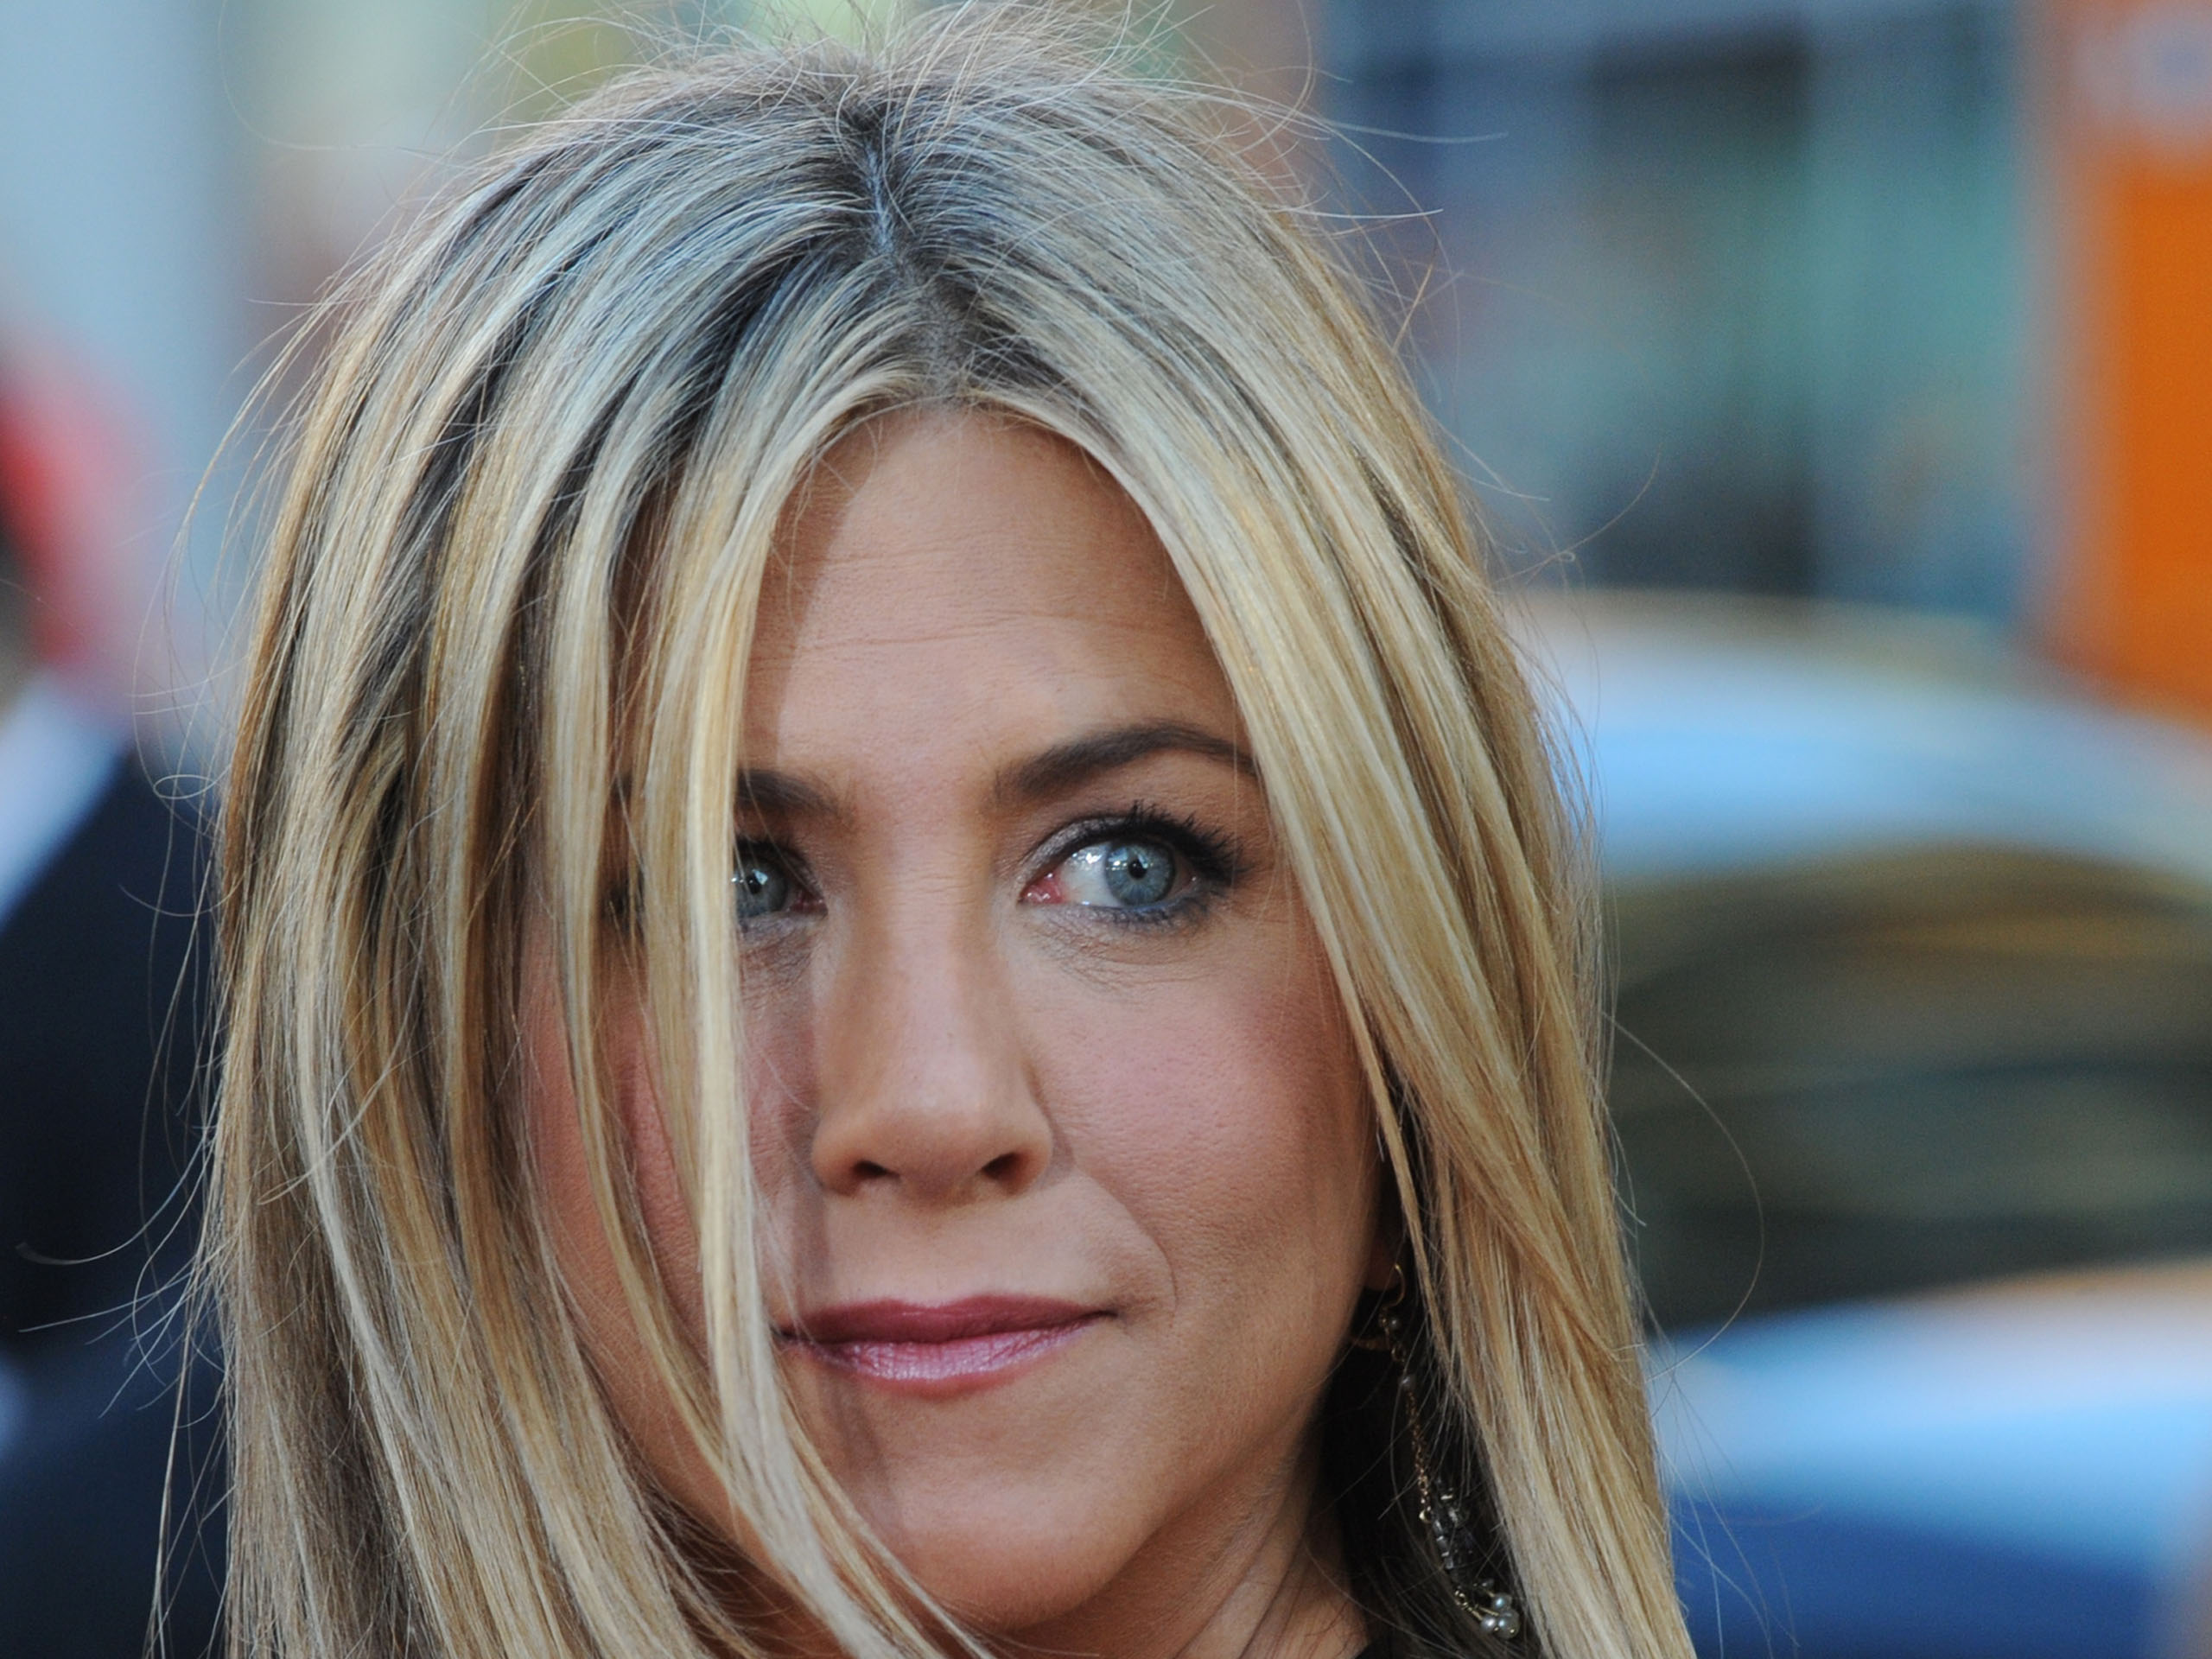 Jennifer Aniston Cute Wallpapers Jennifer Aniston Hd Wallpapers Popopics Com